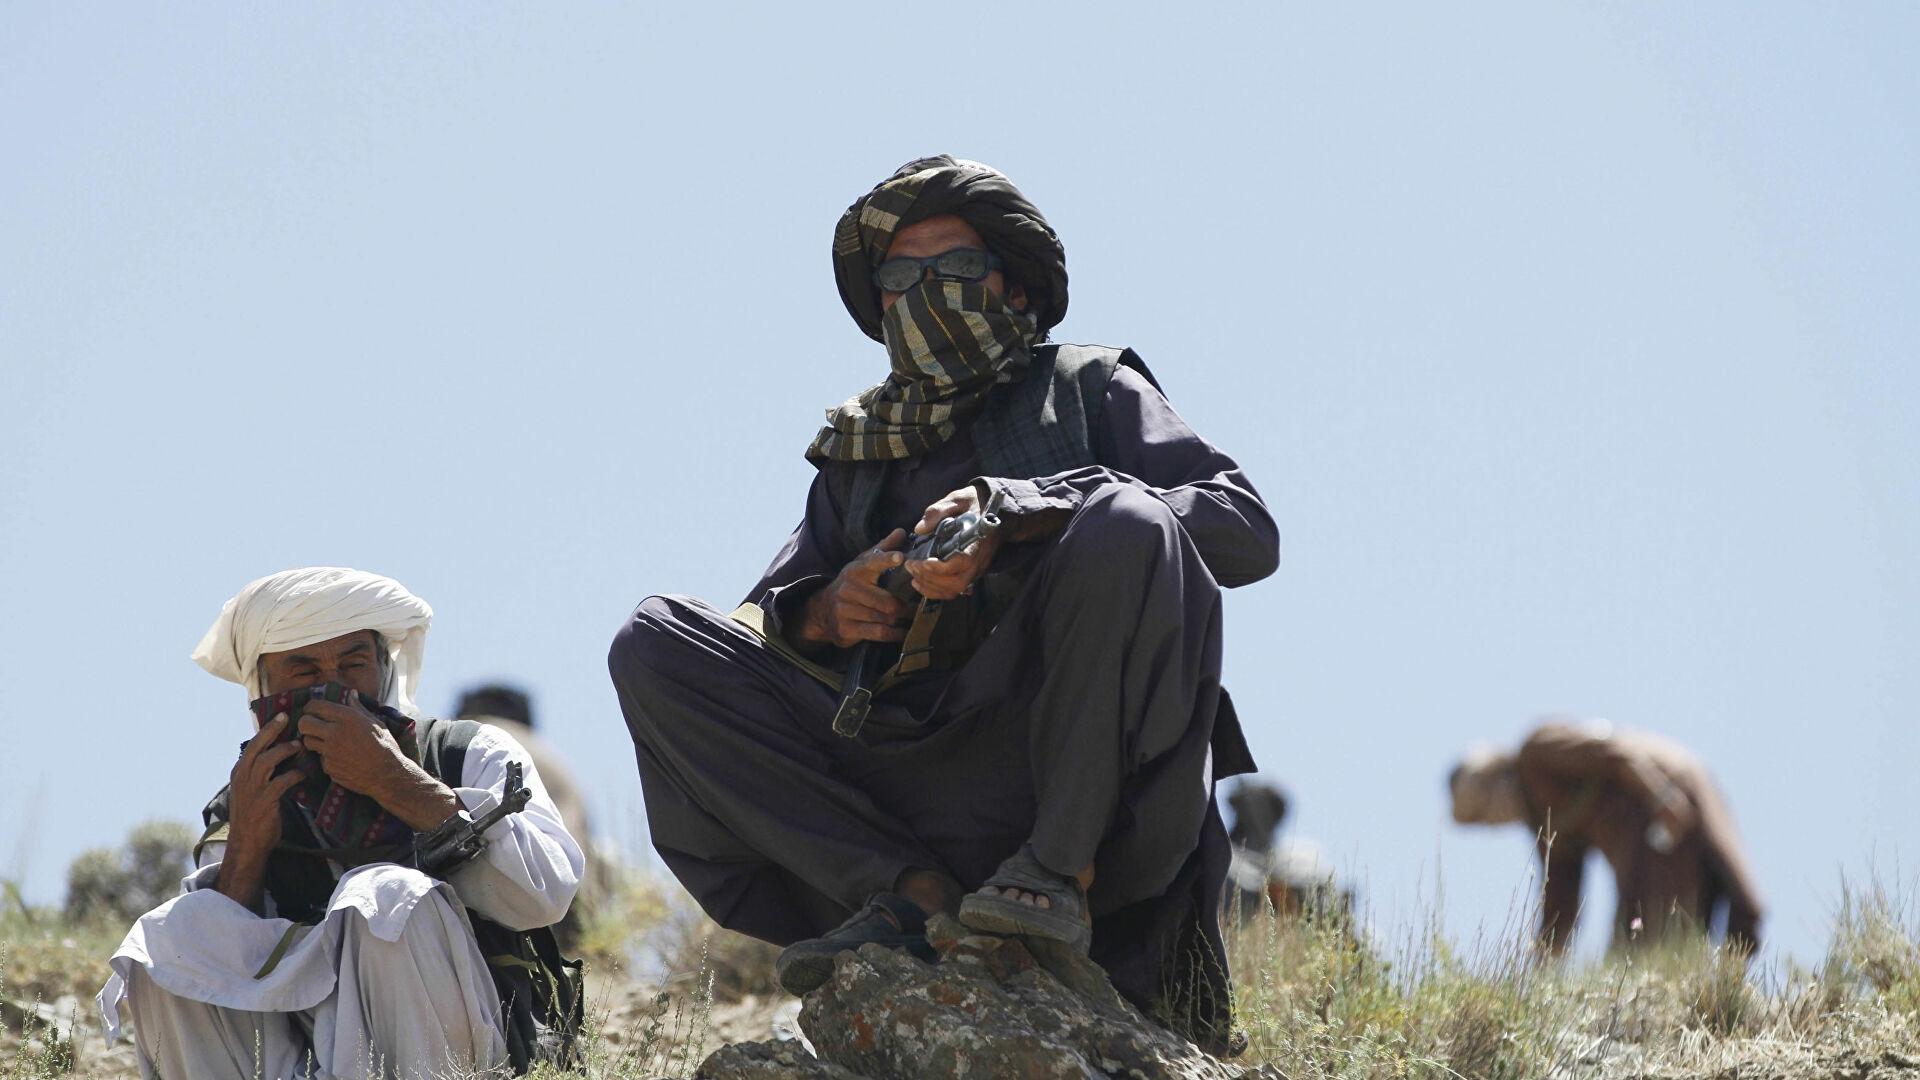 I talebani afgani